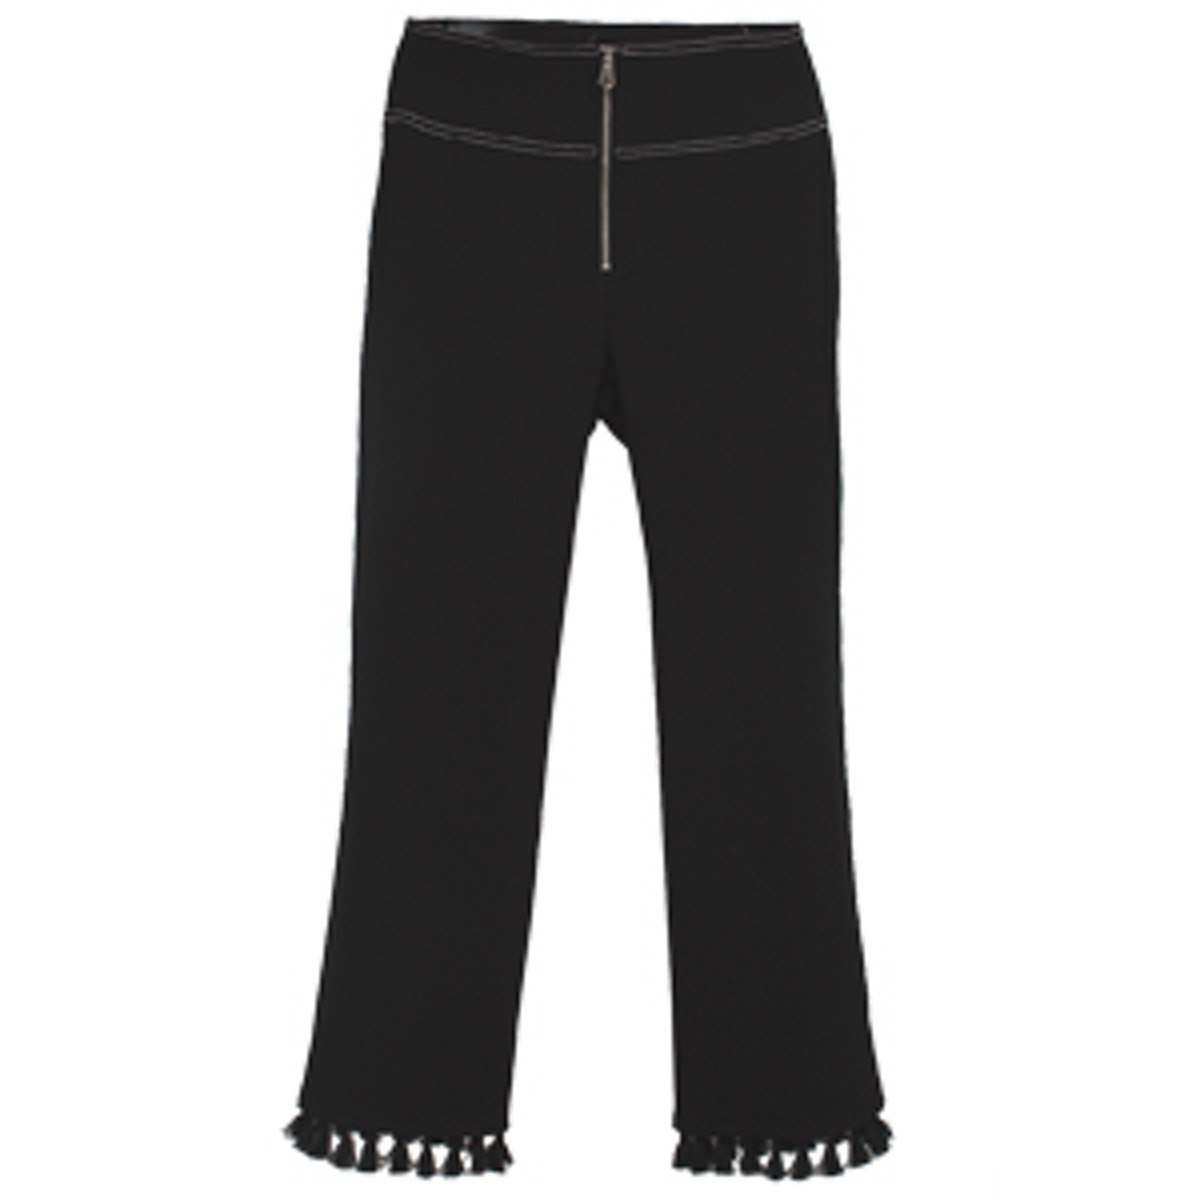 Youlah Tassel Pants